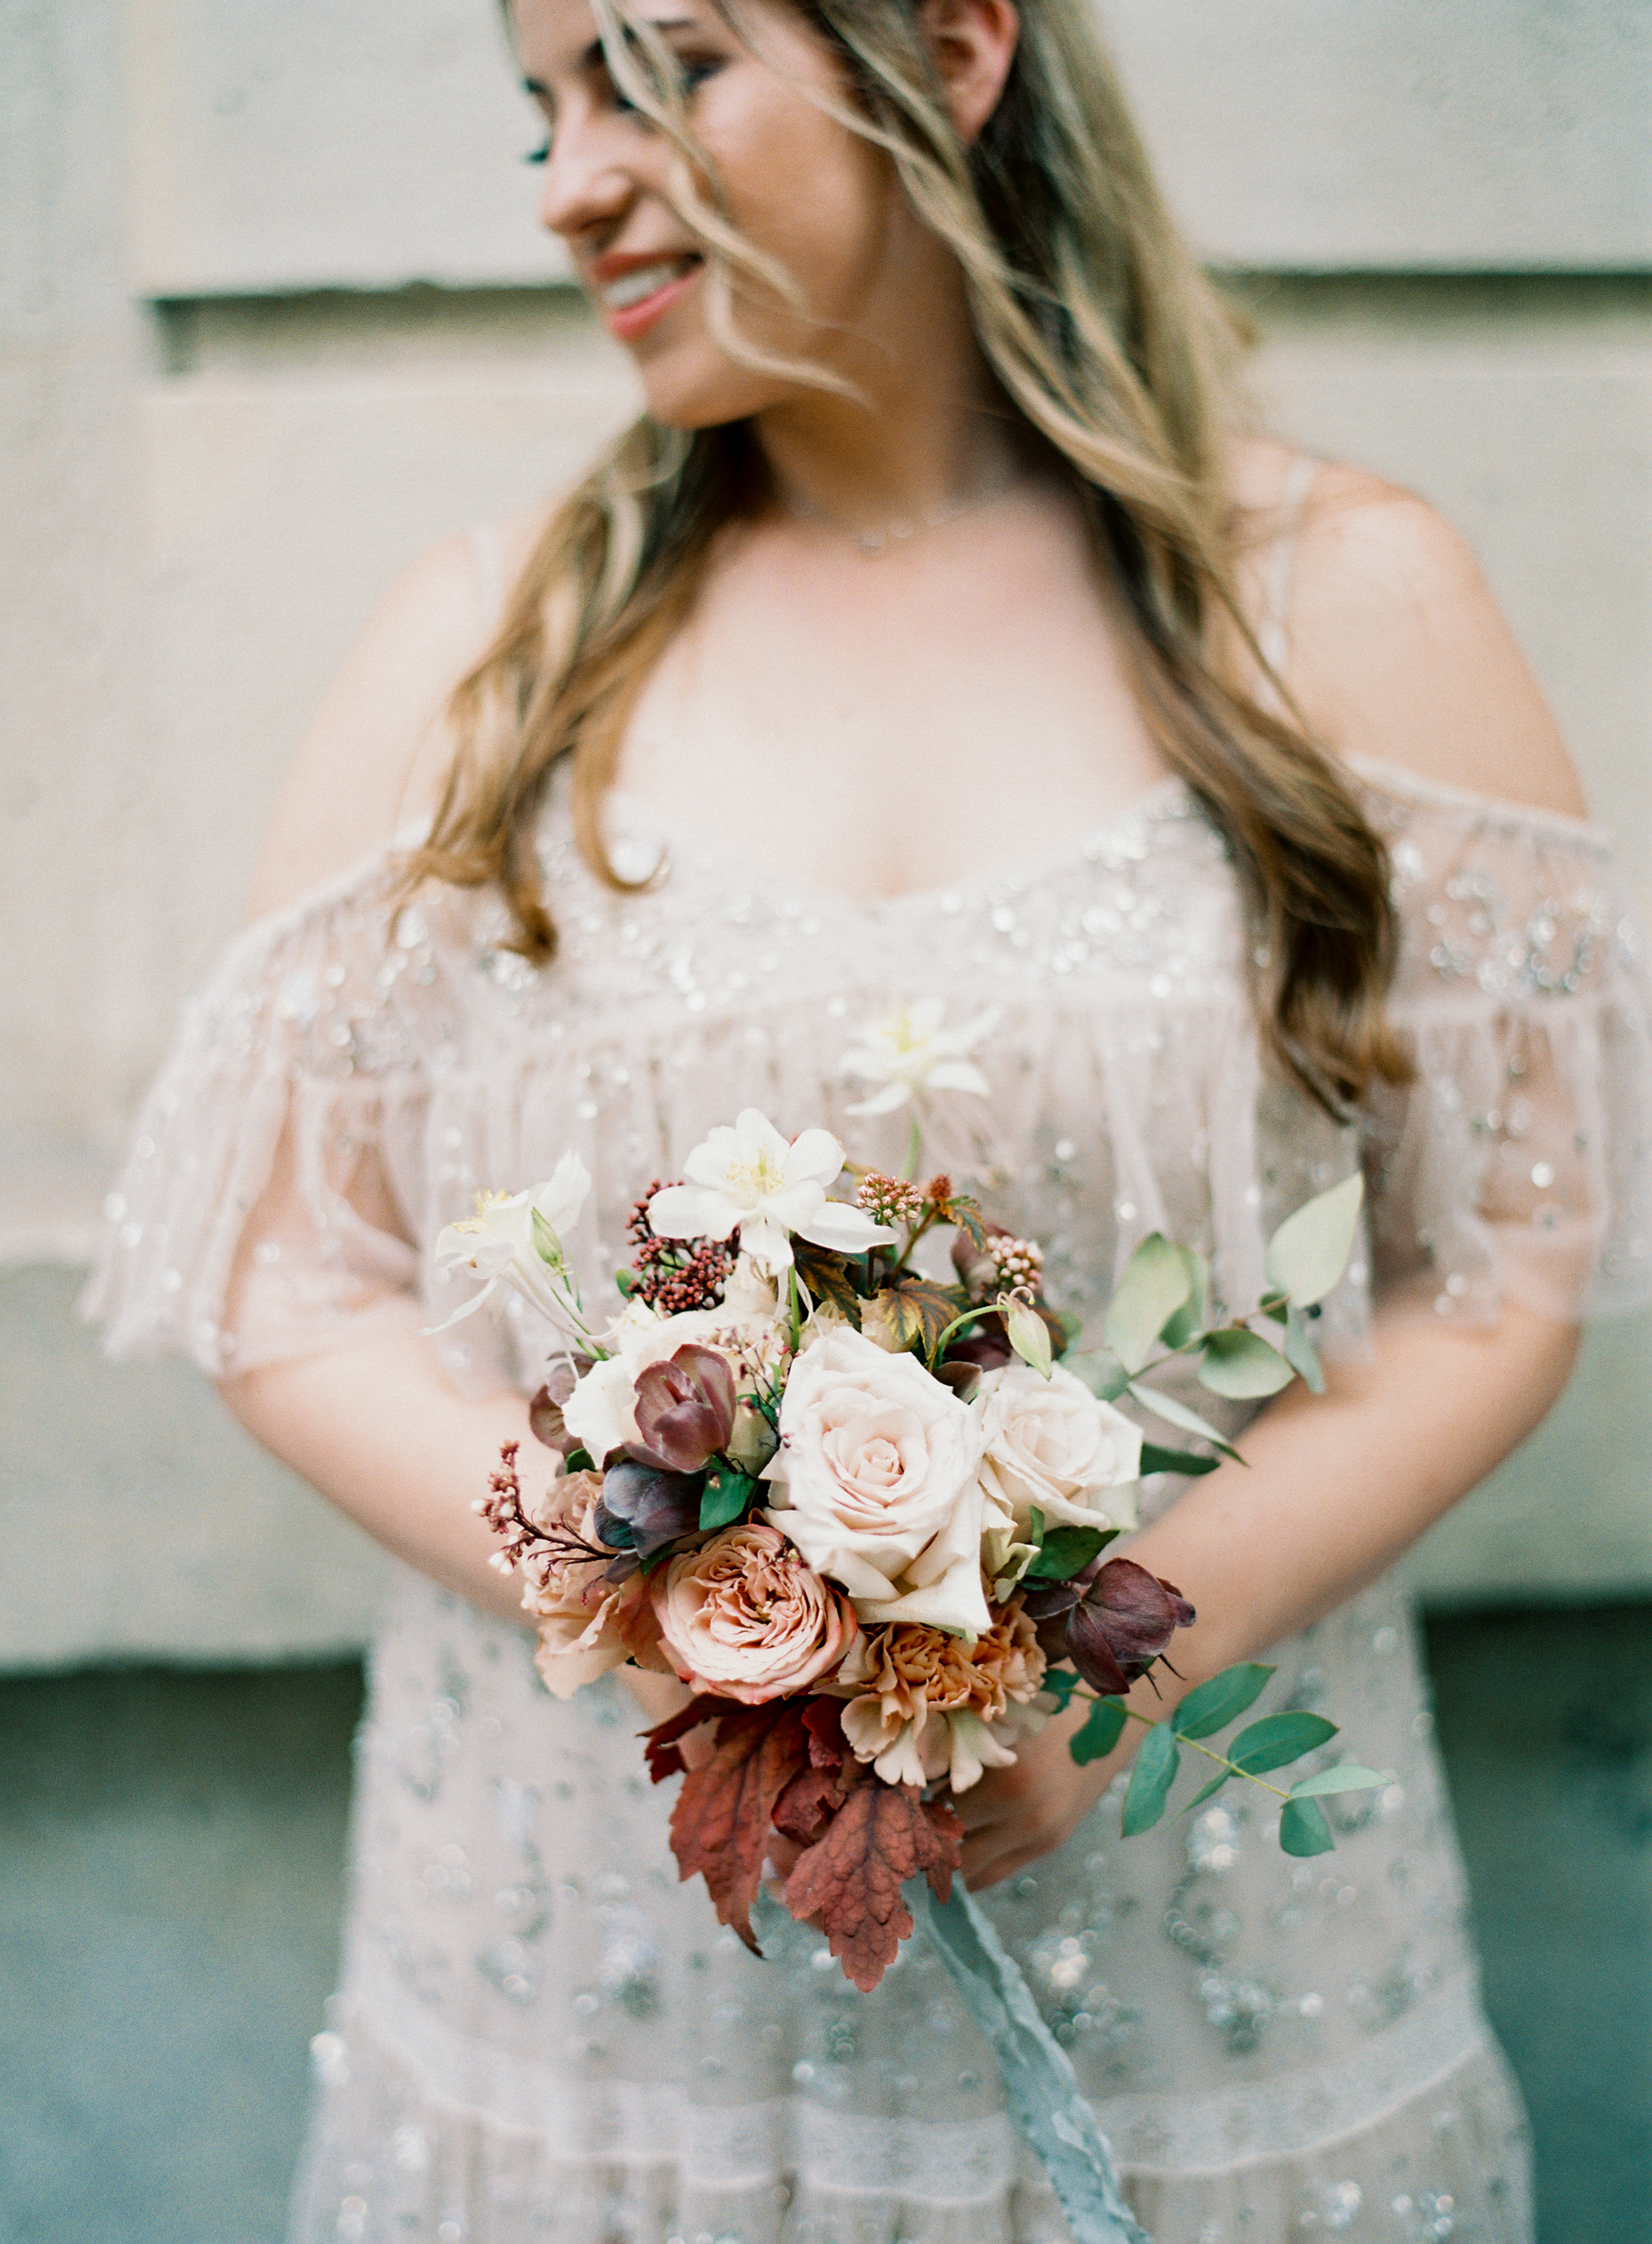 Paris-France-Film-Wedding-Carrie King Photographer-115.jpg